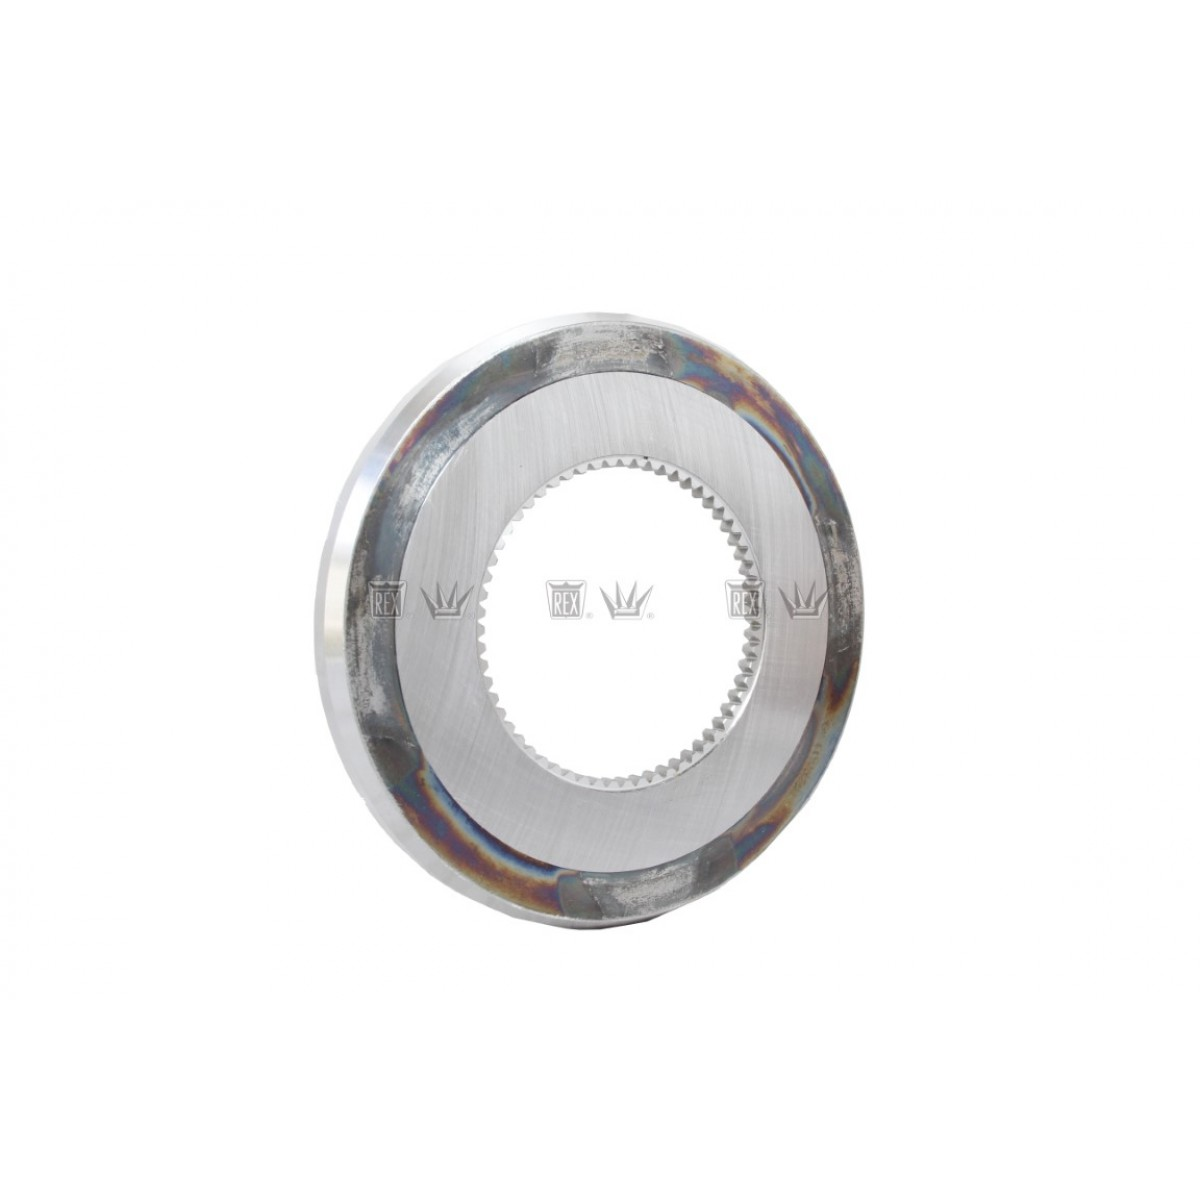 Capa sincronizador caixa cambio Eaton FS5306/FS6305/FS6306